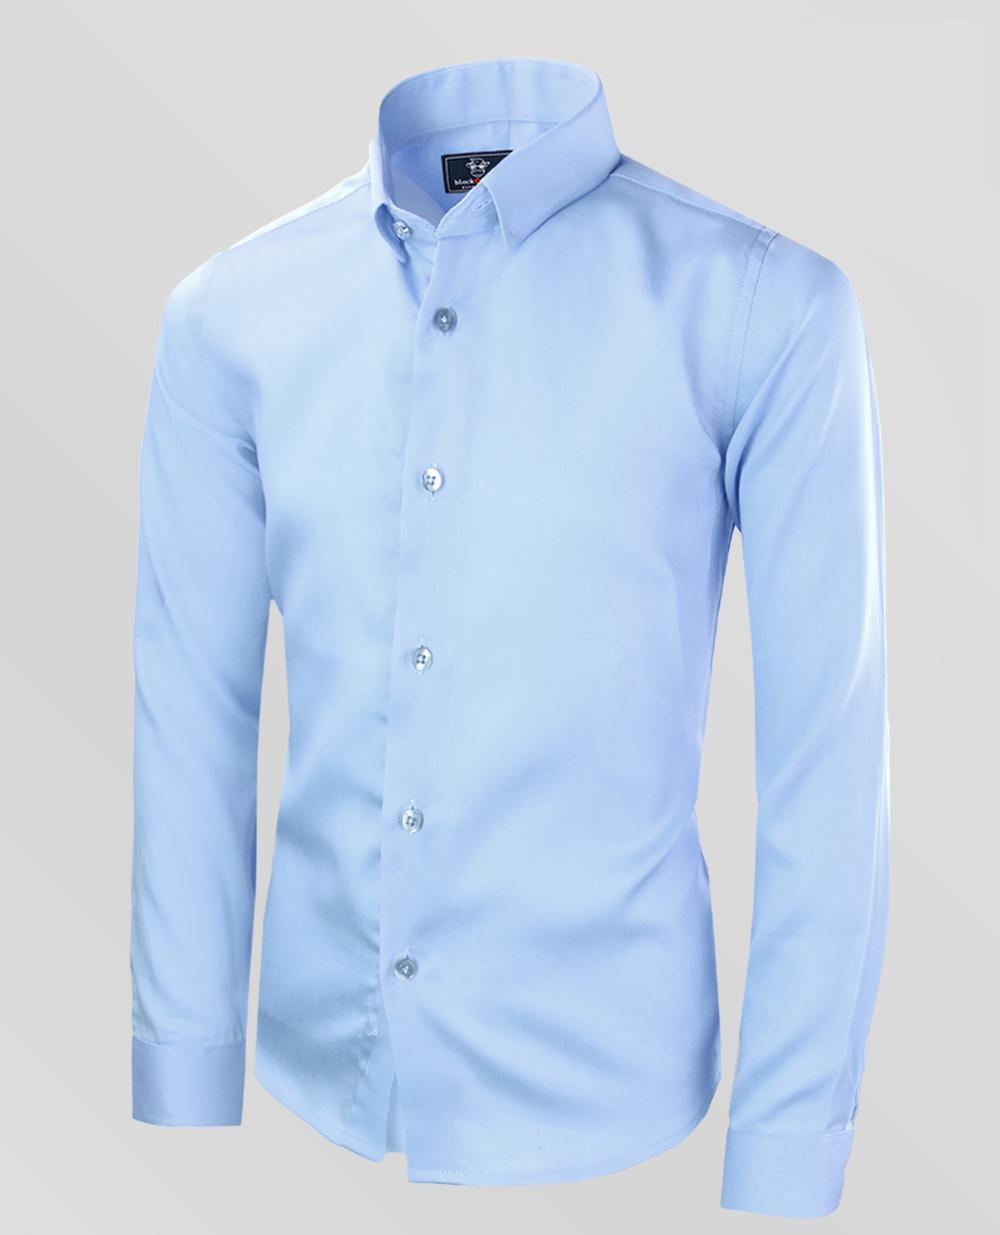 Black N Bianco Boys Signature Button Down Sateen Light Blue Dress Shirt